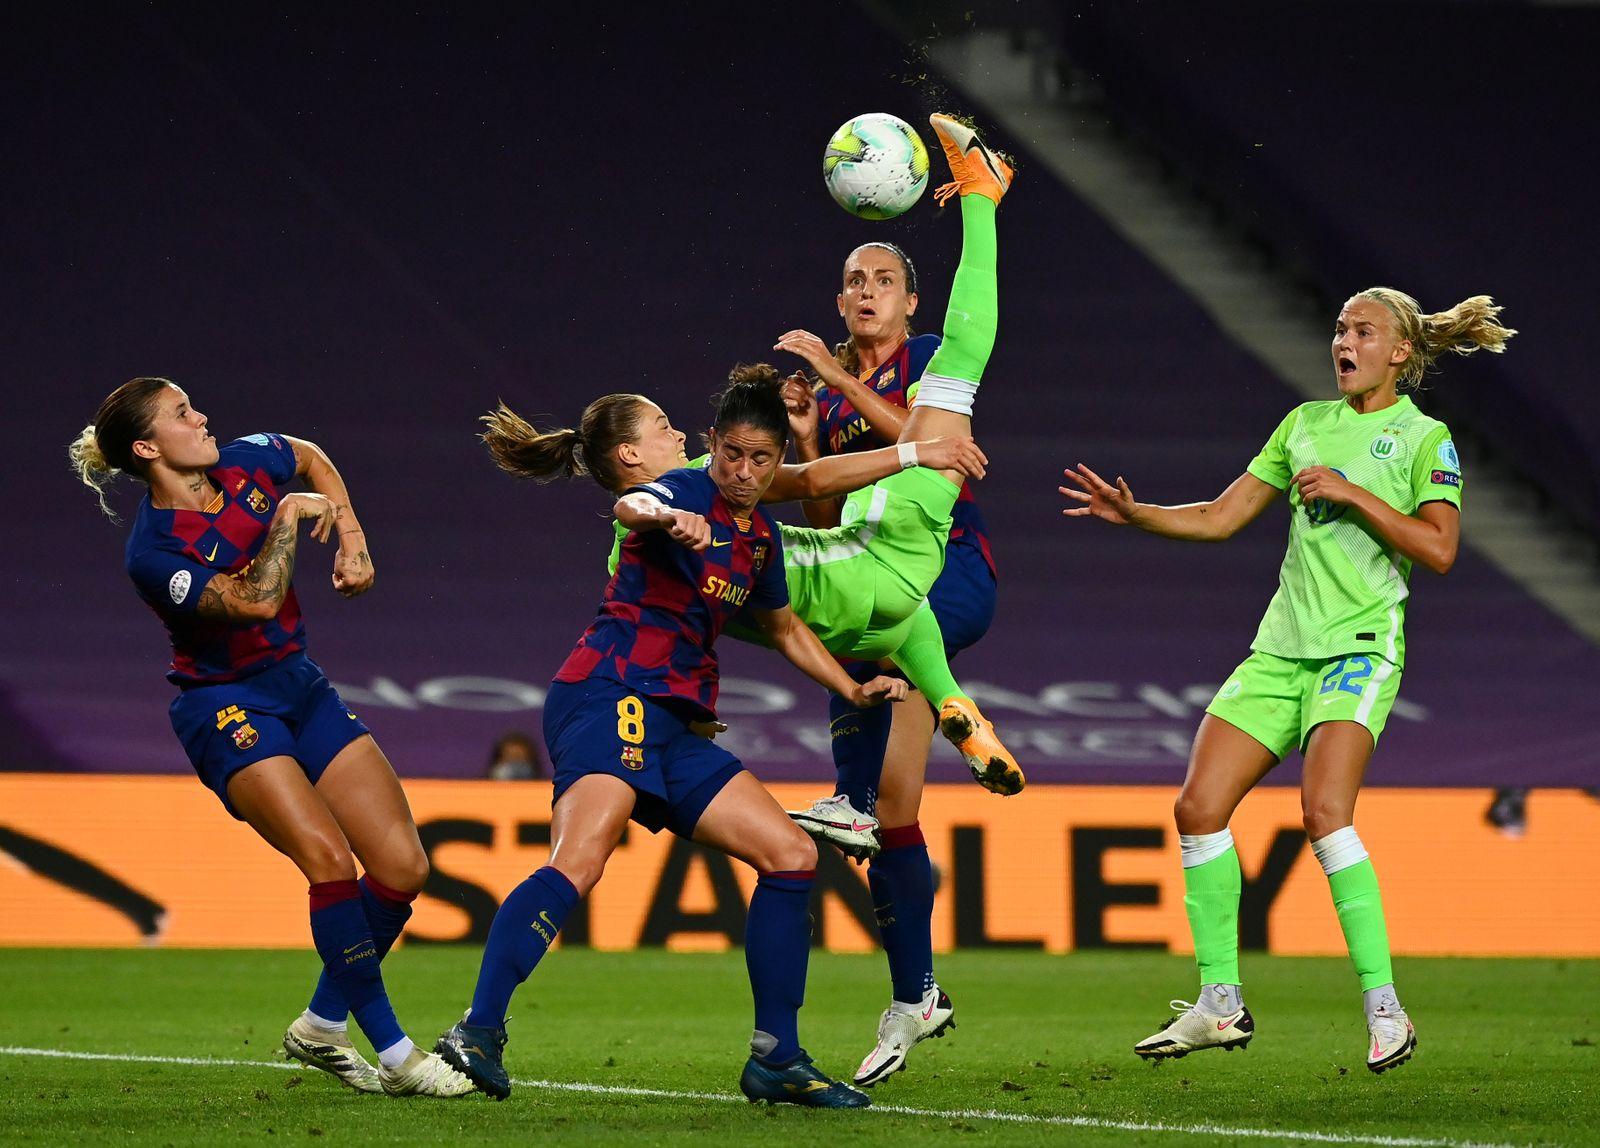 Women's Champions League - Semi Final - VfL Wolfsburg v FC Barcelona